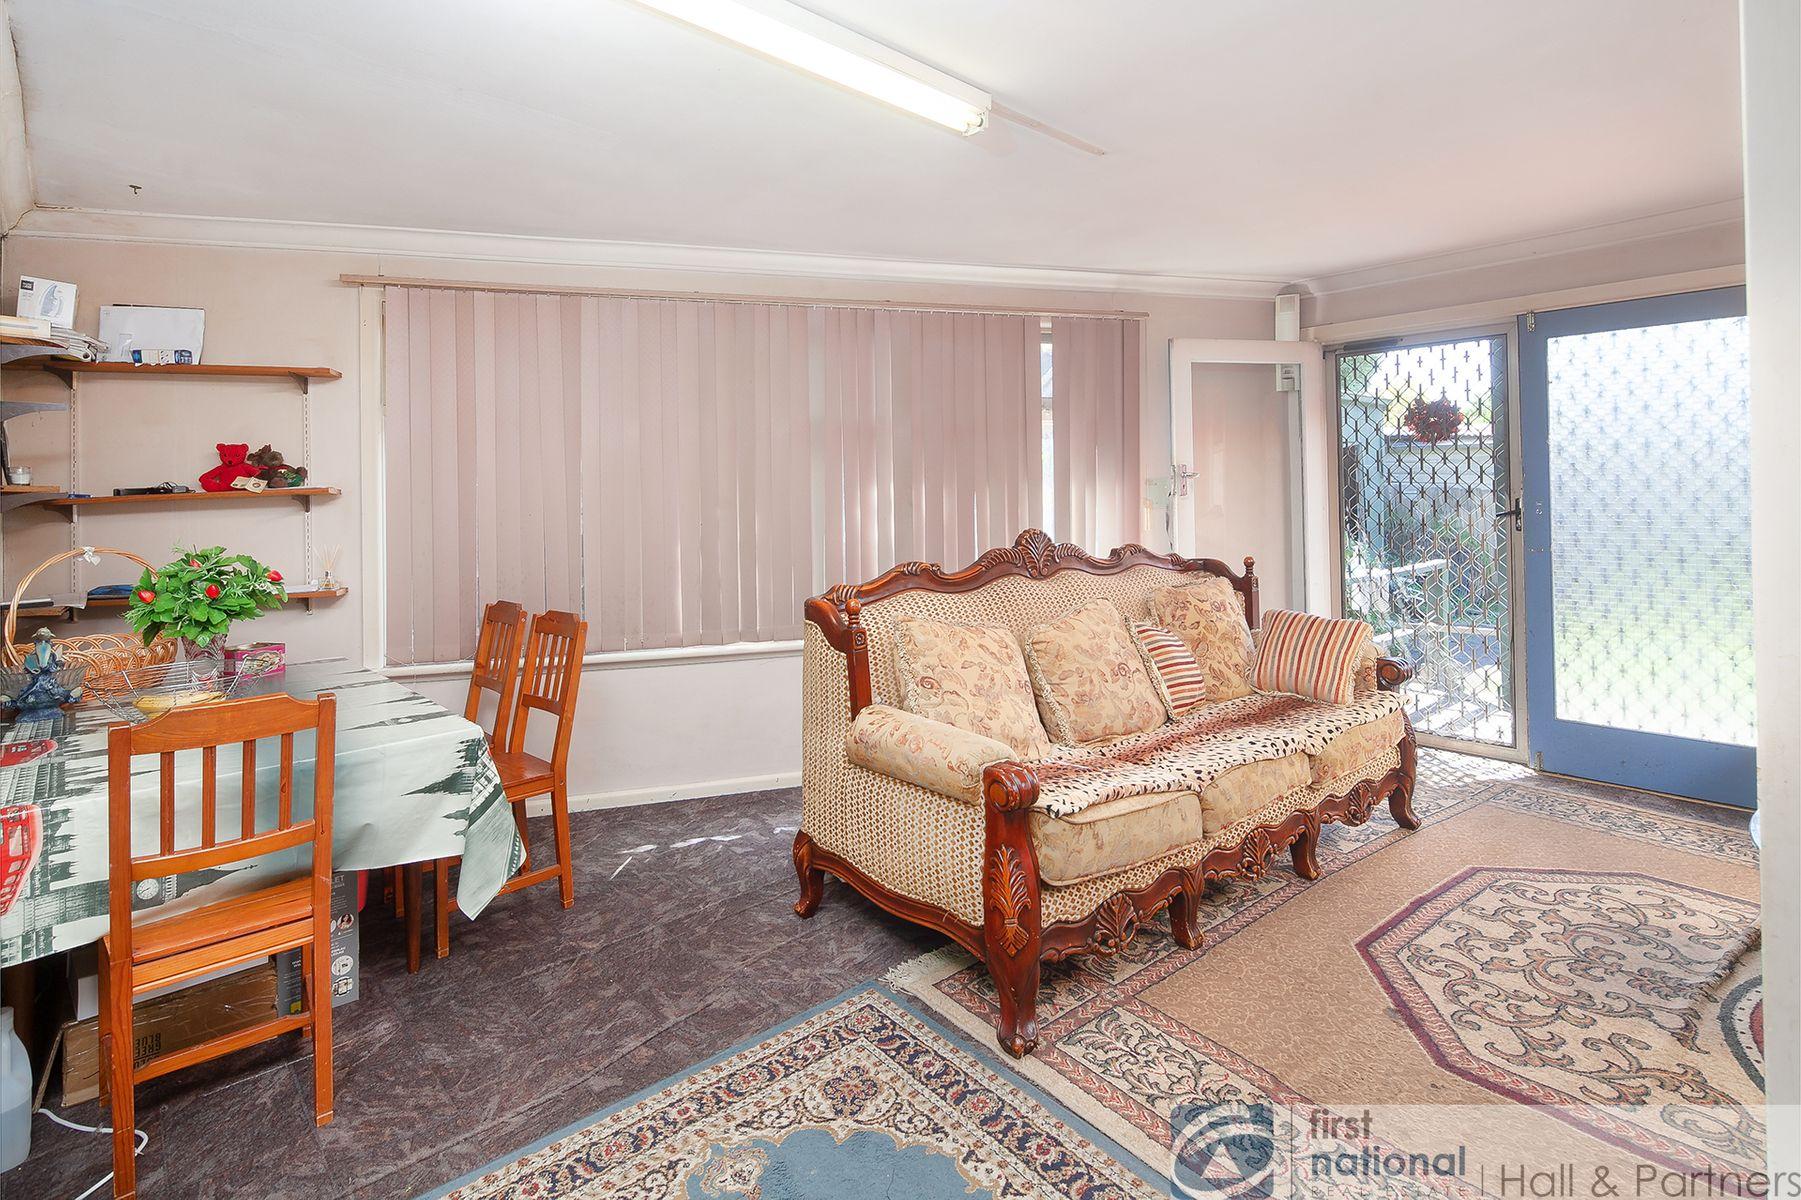 86 Cleeland Street, Dandenong, VIC 3175